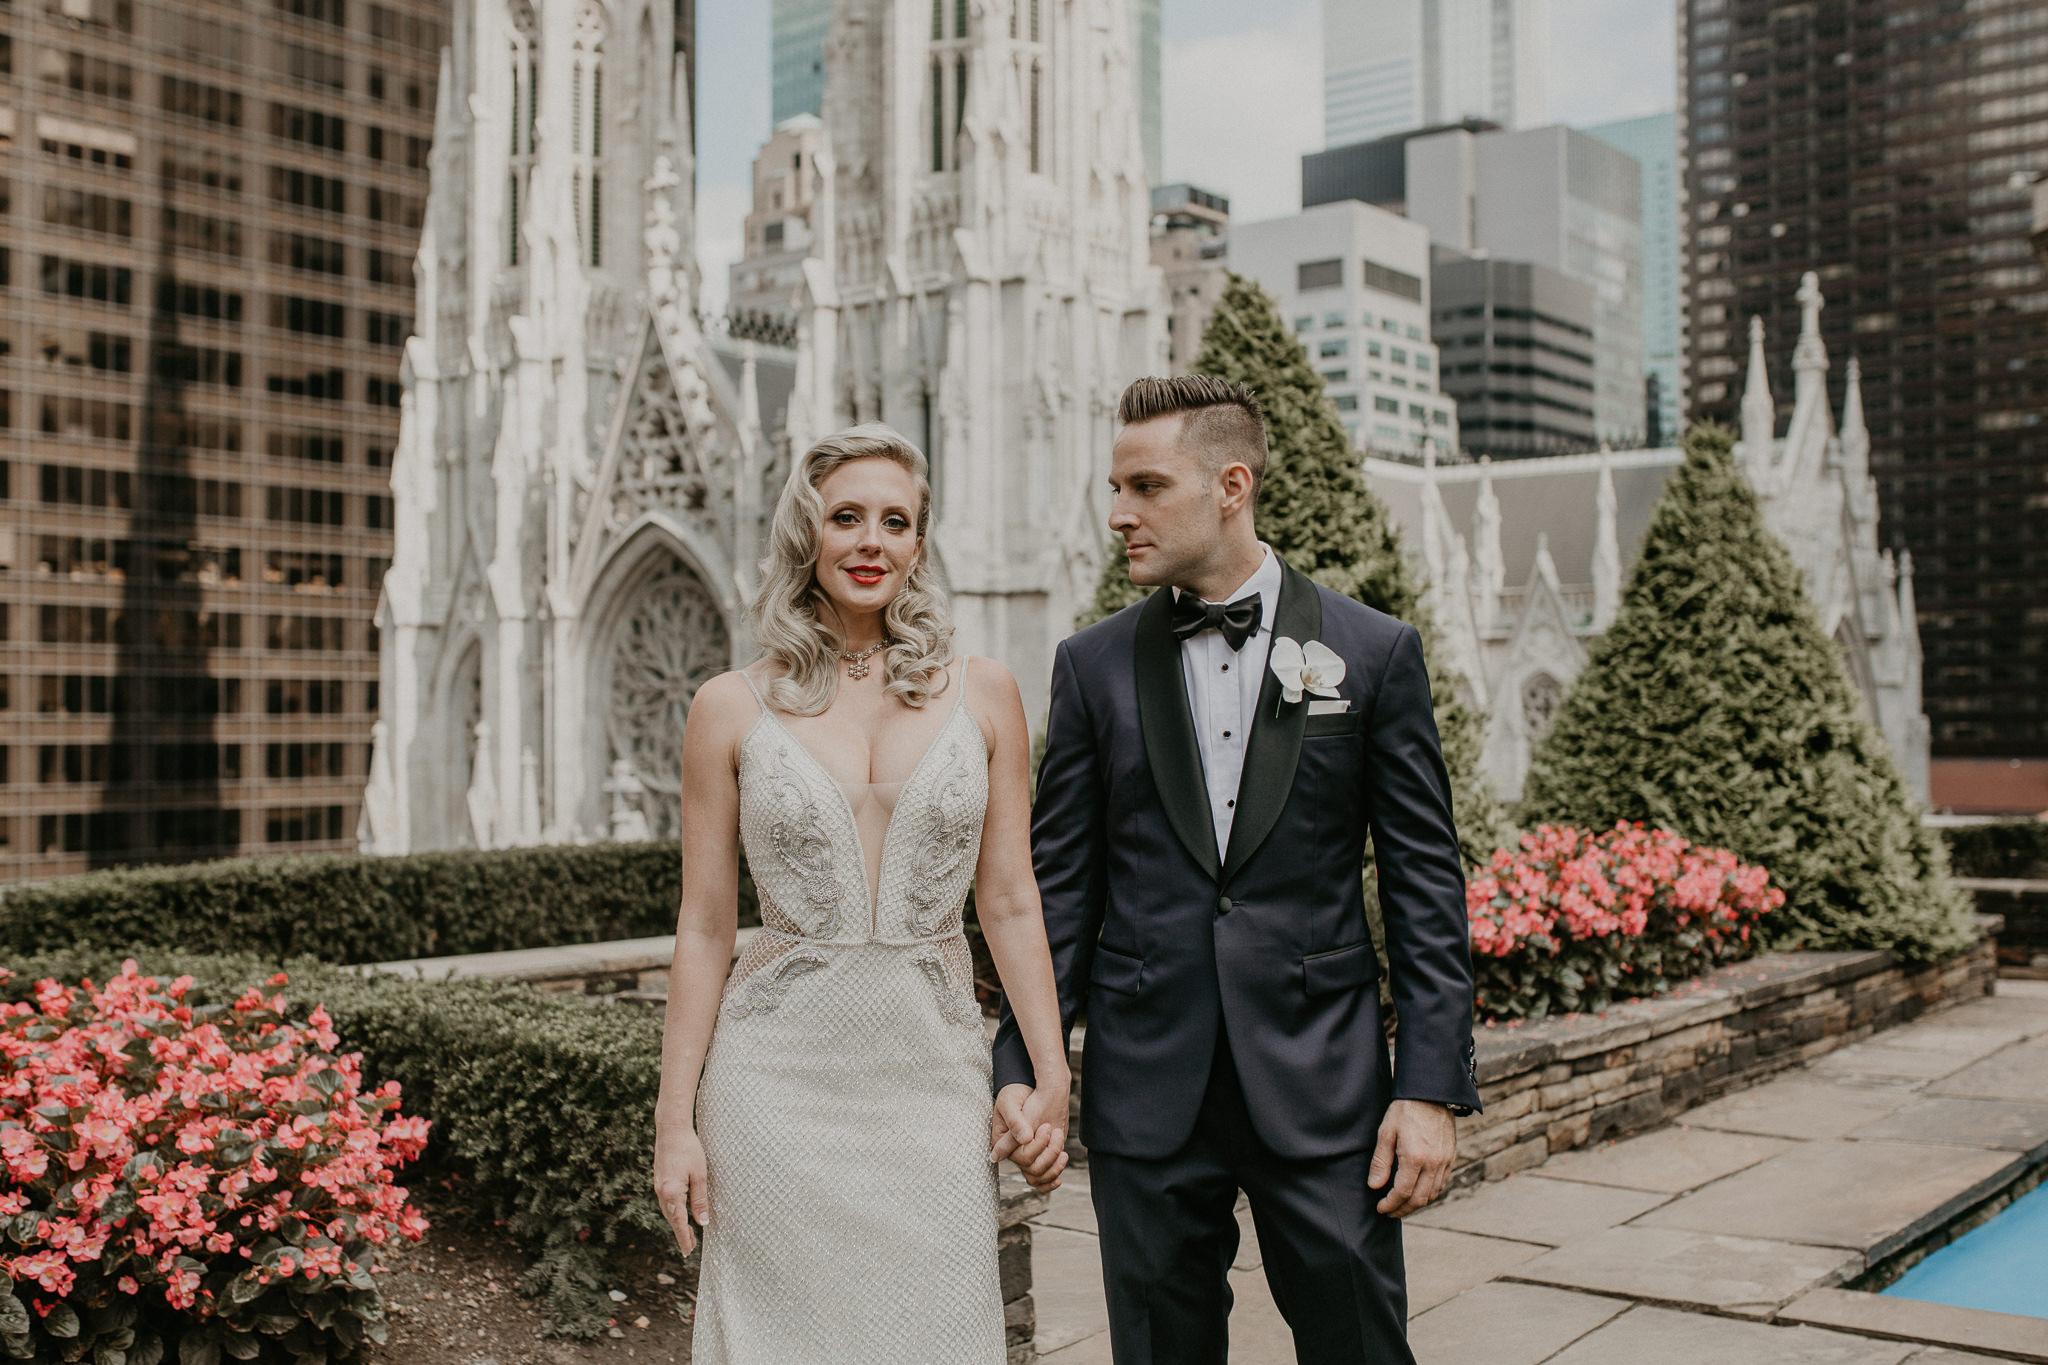 M+J_NYC_Wedding_StPatricks_30Rock_RainbowRoom_058.jpg